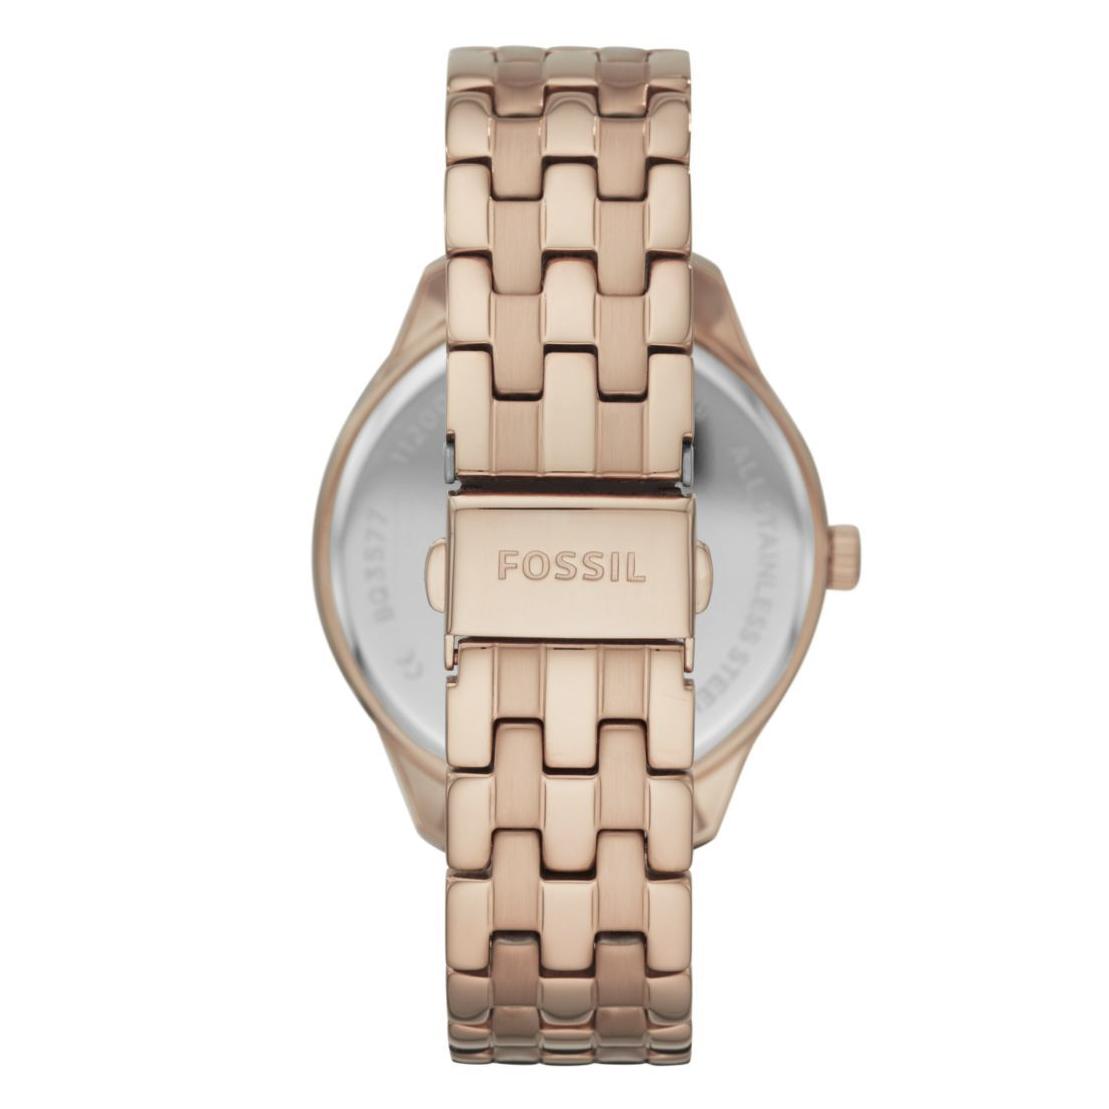 Fossil BQ3576 zegarek Retro Digital LCD